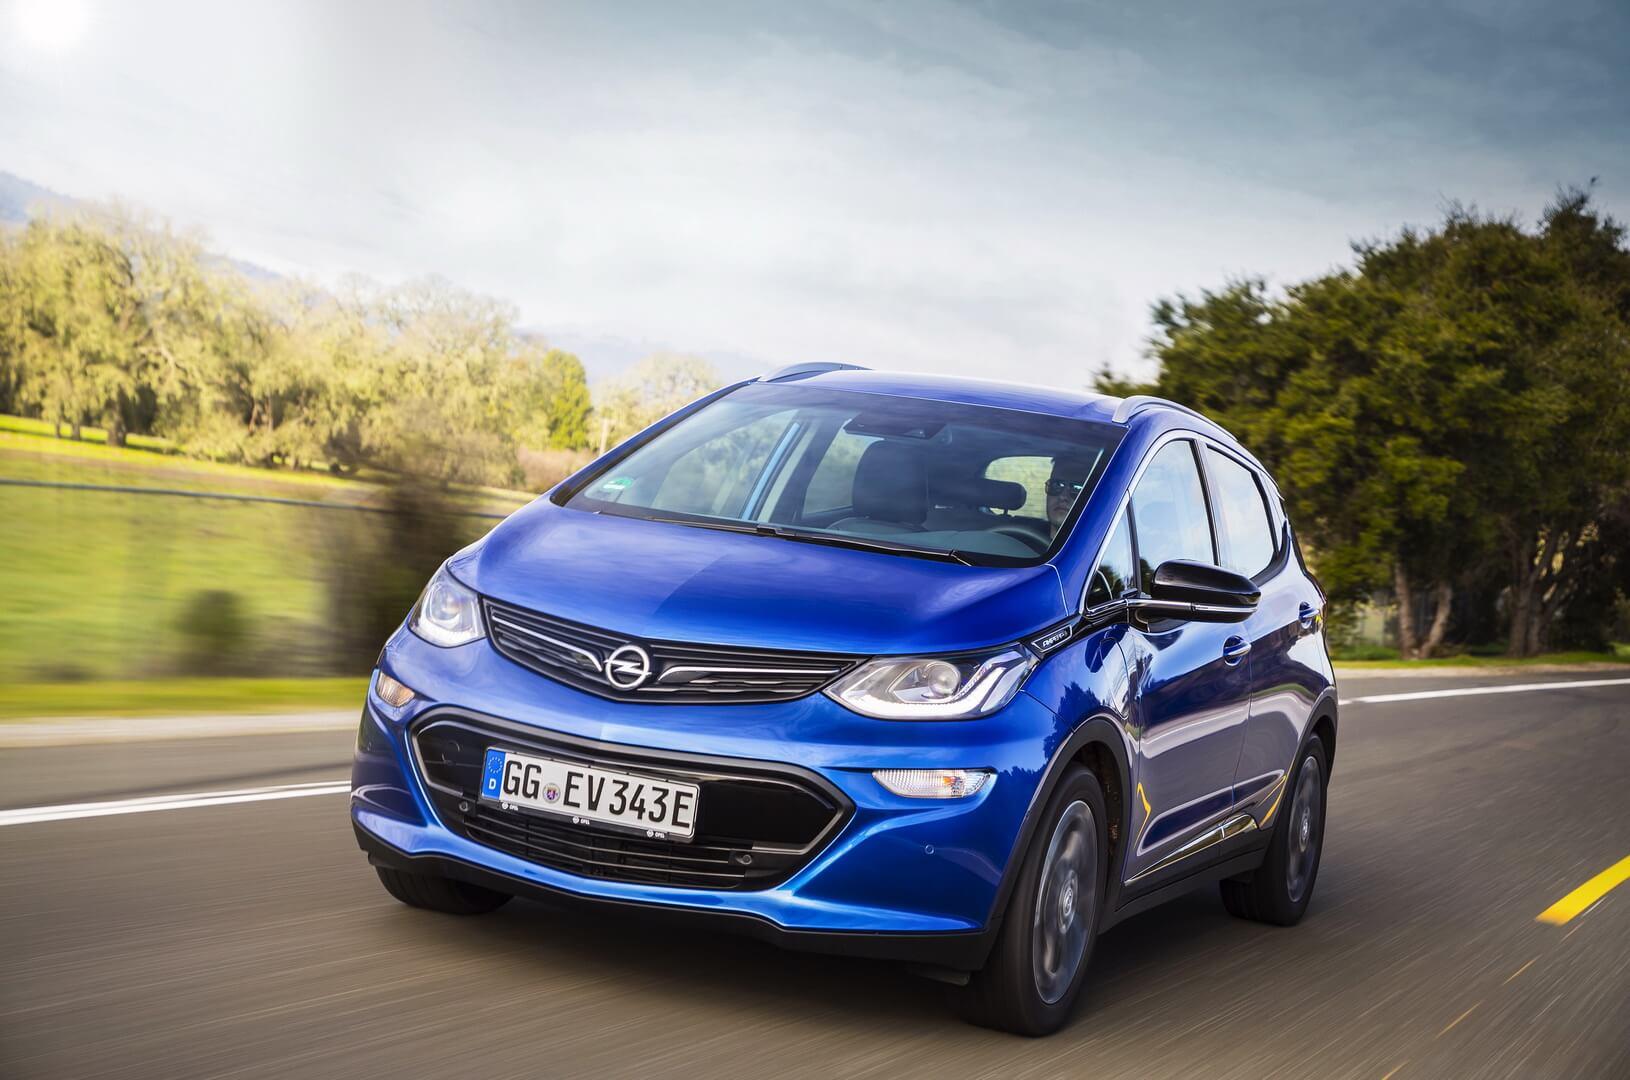 Фотография экоавто Opel Ampera-e - фото 6